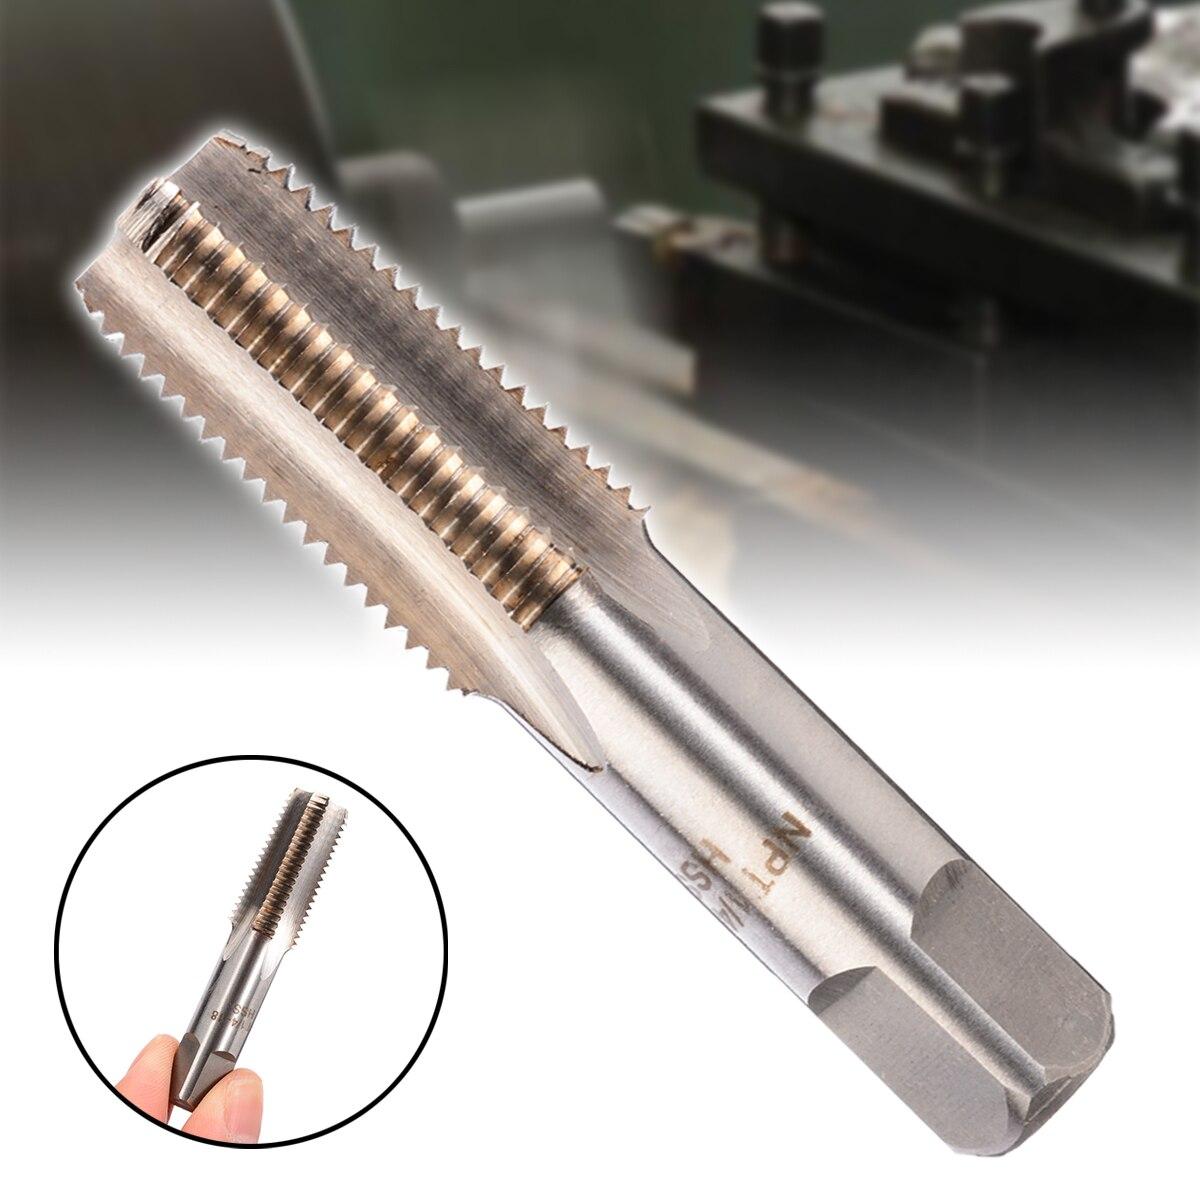 Lots 1pc HSS Machine 1//4-18 NPT Plug Tap and 1pc 1//4-18 NPT Die Threading Tool